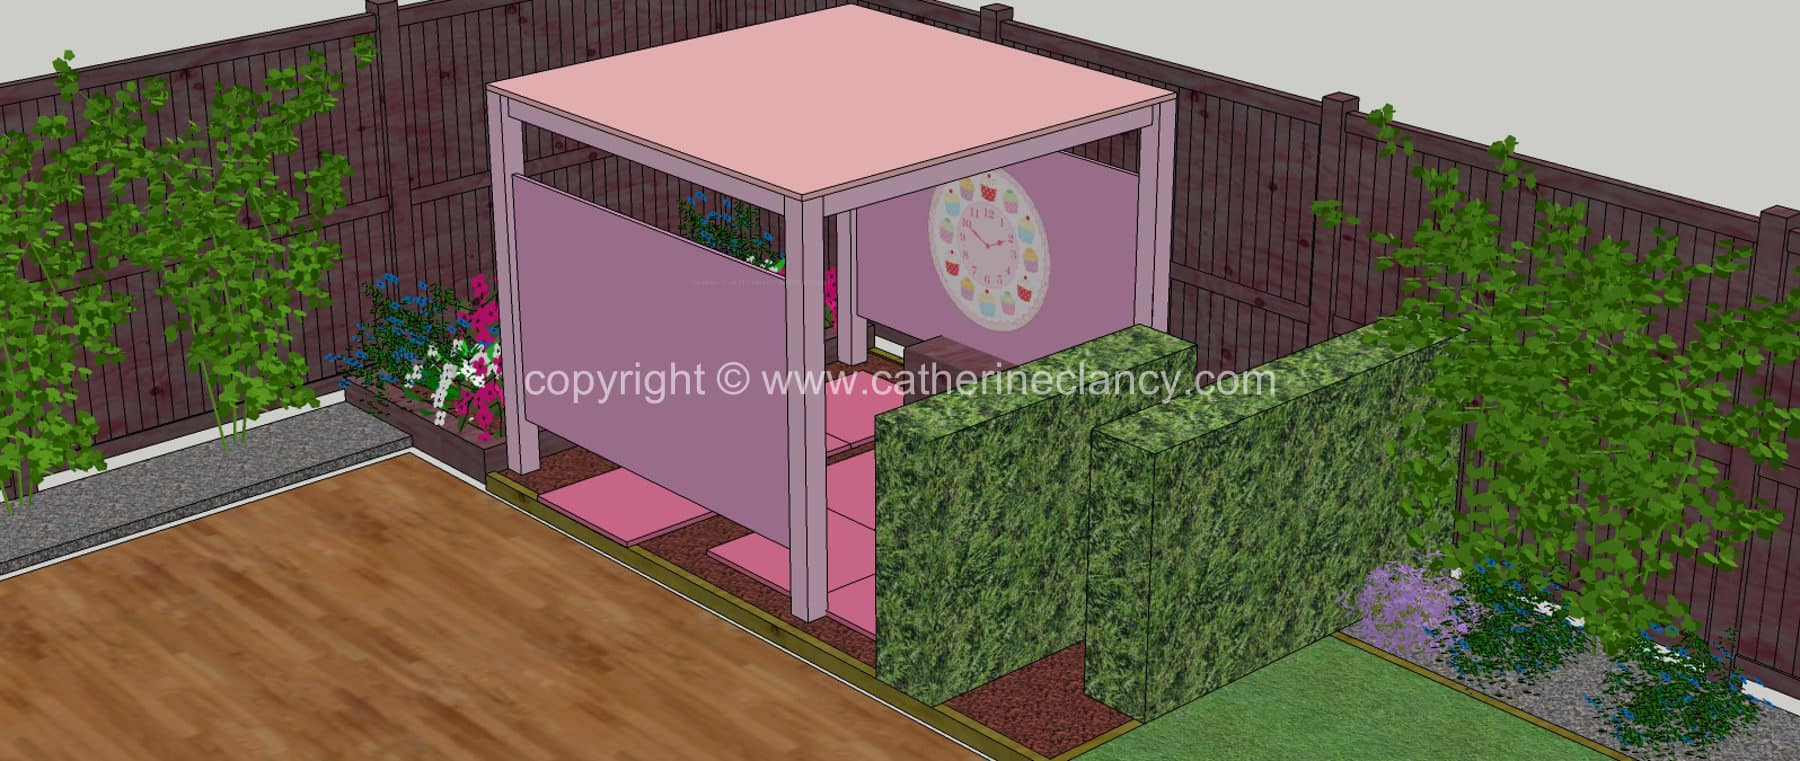 ecostudio-garden-london-8